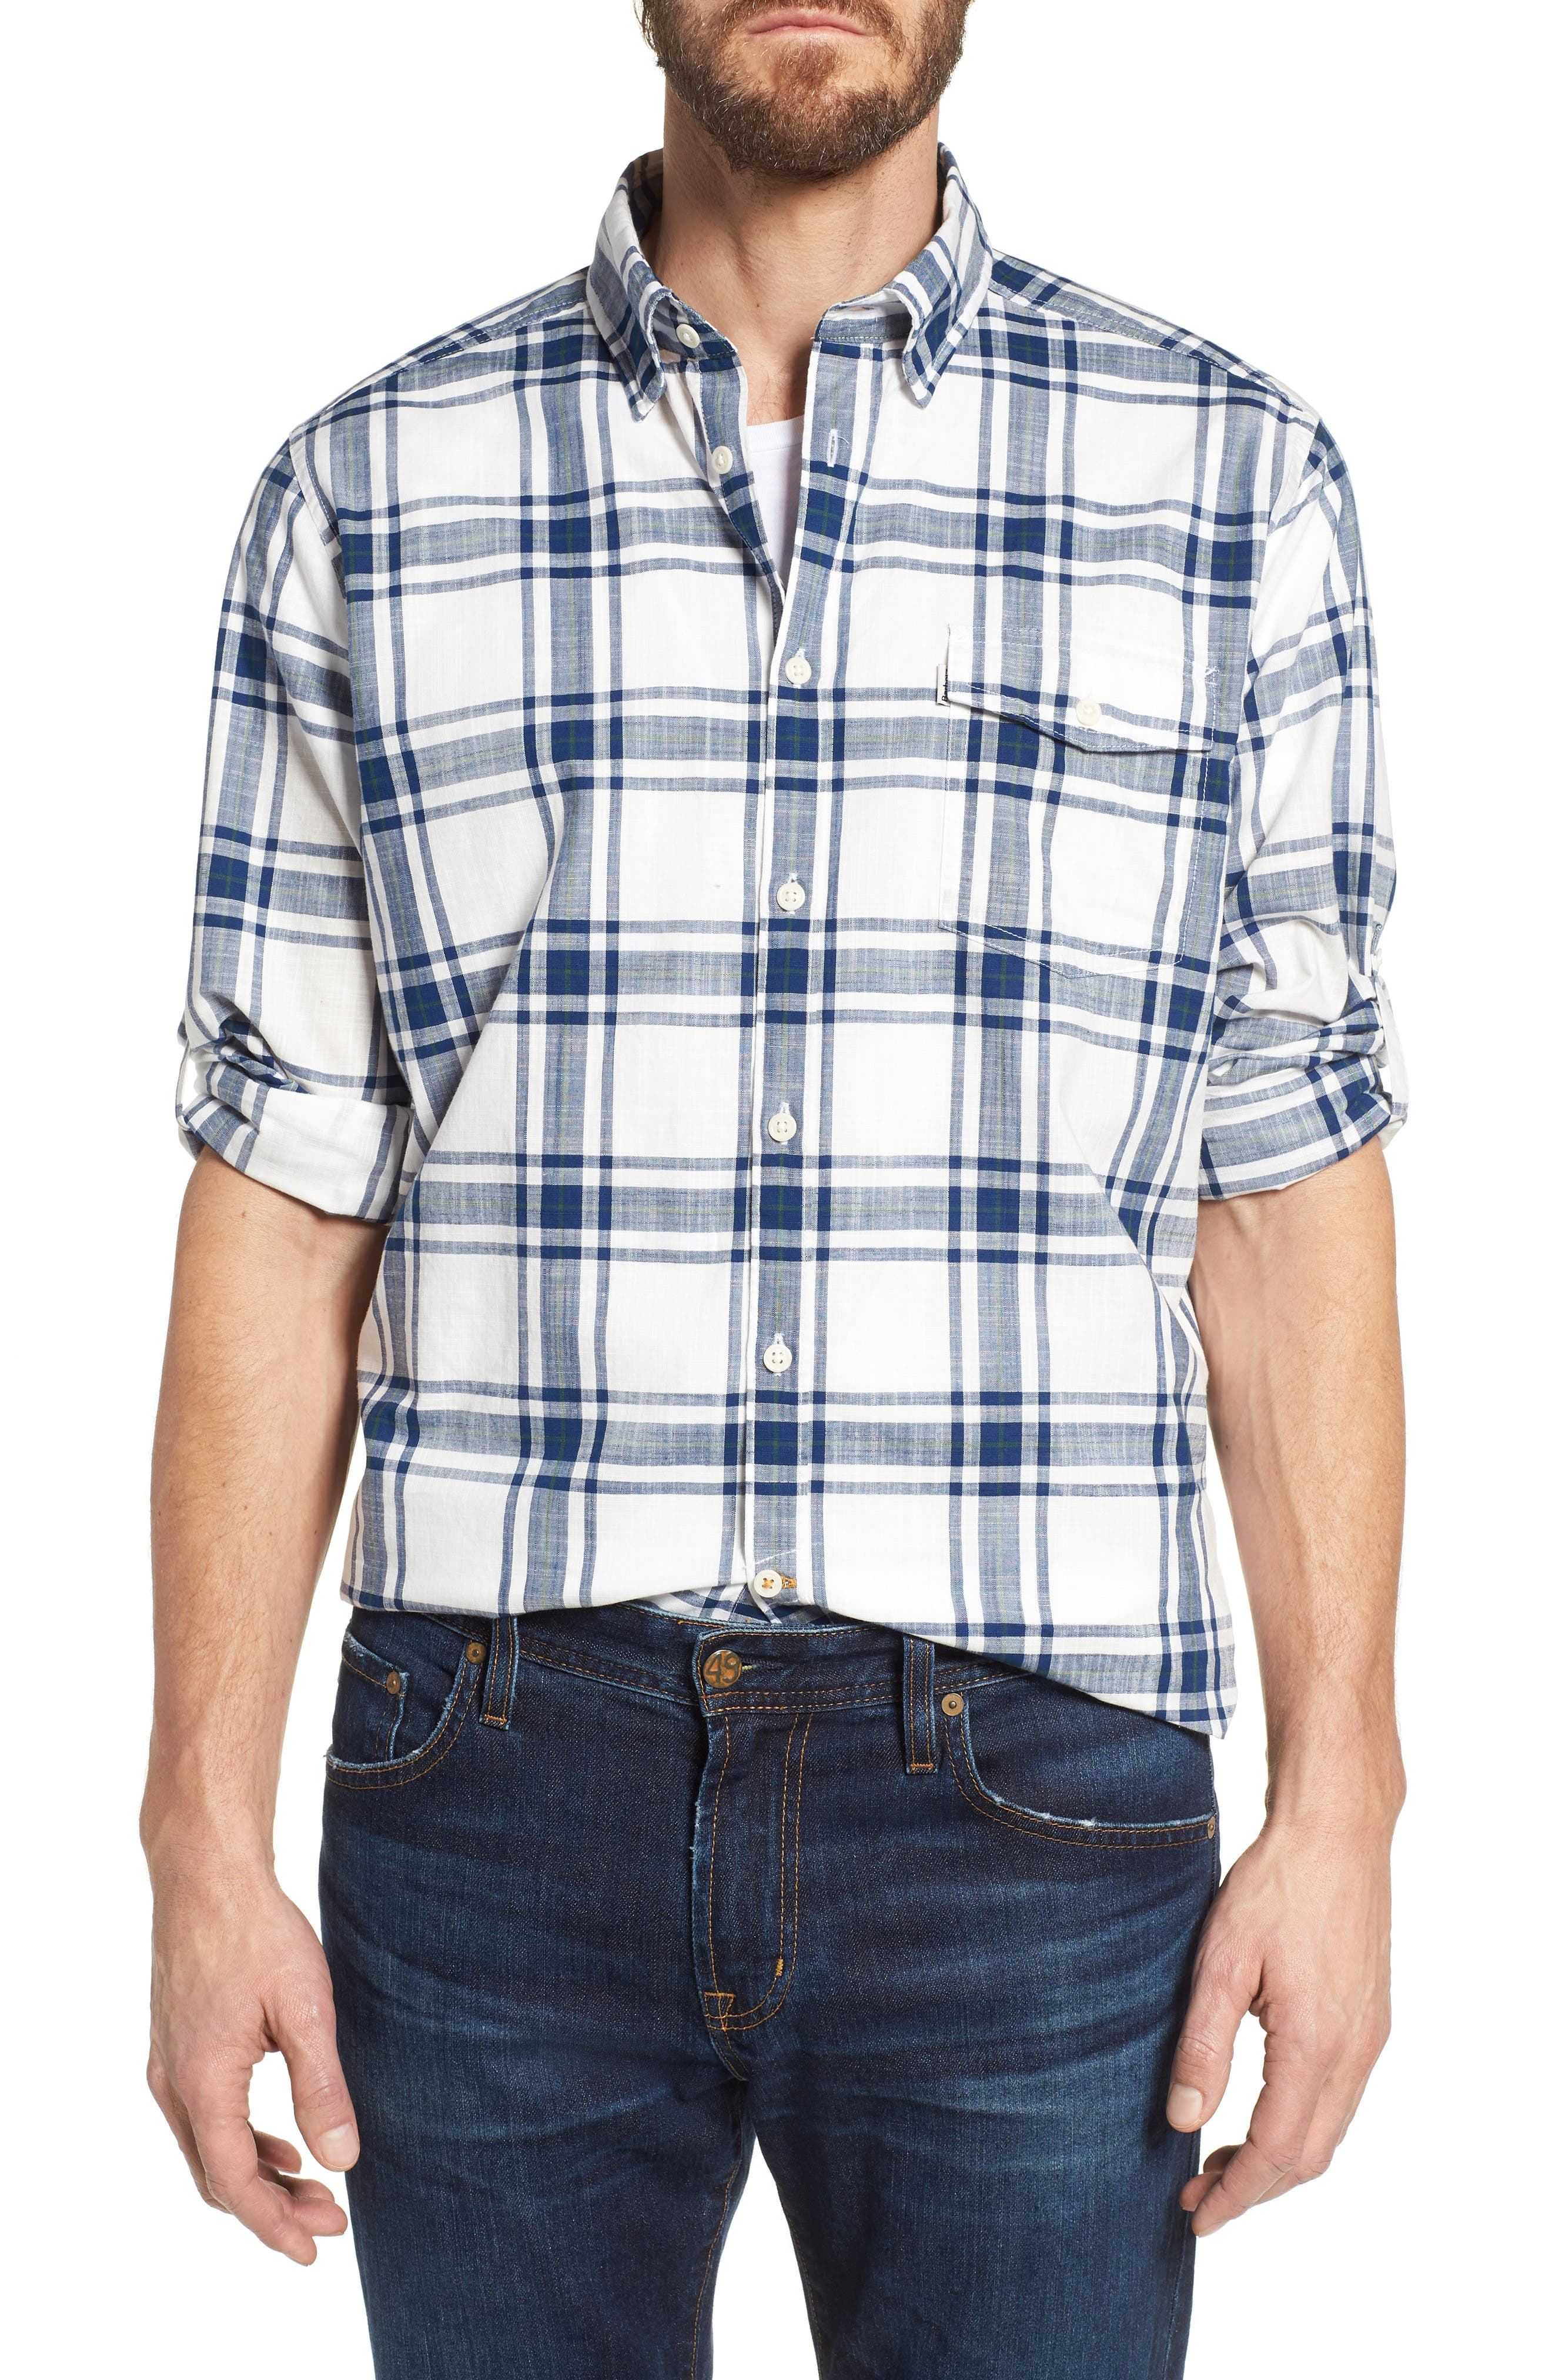 Elver Tailored Fit Plaid Sport Shirt,                             Main thumbnail 1, color,                             330